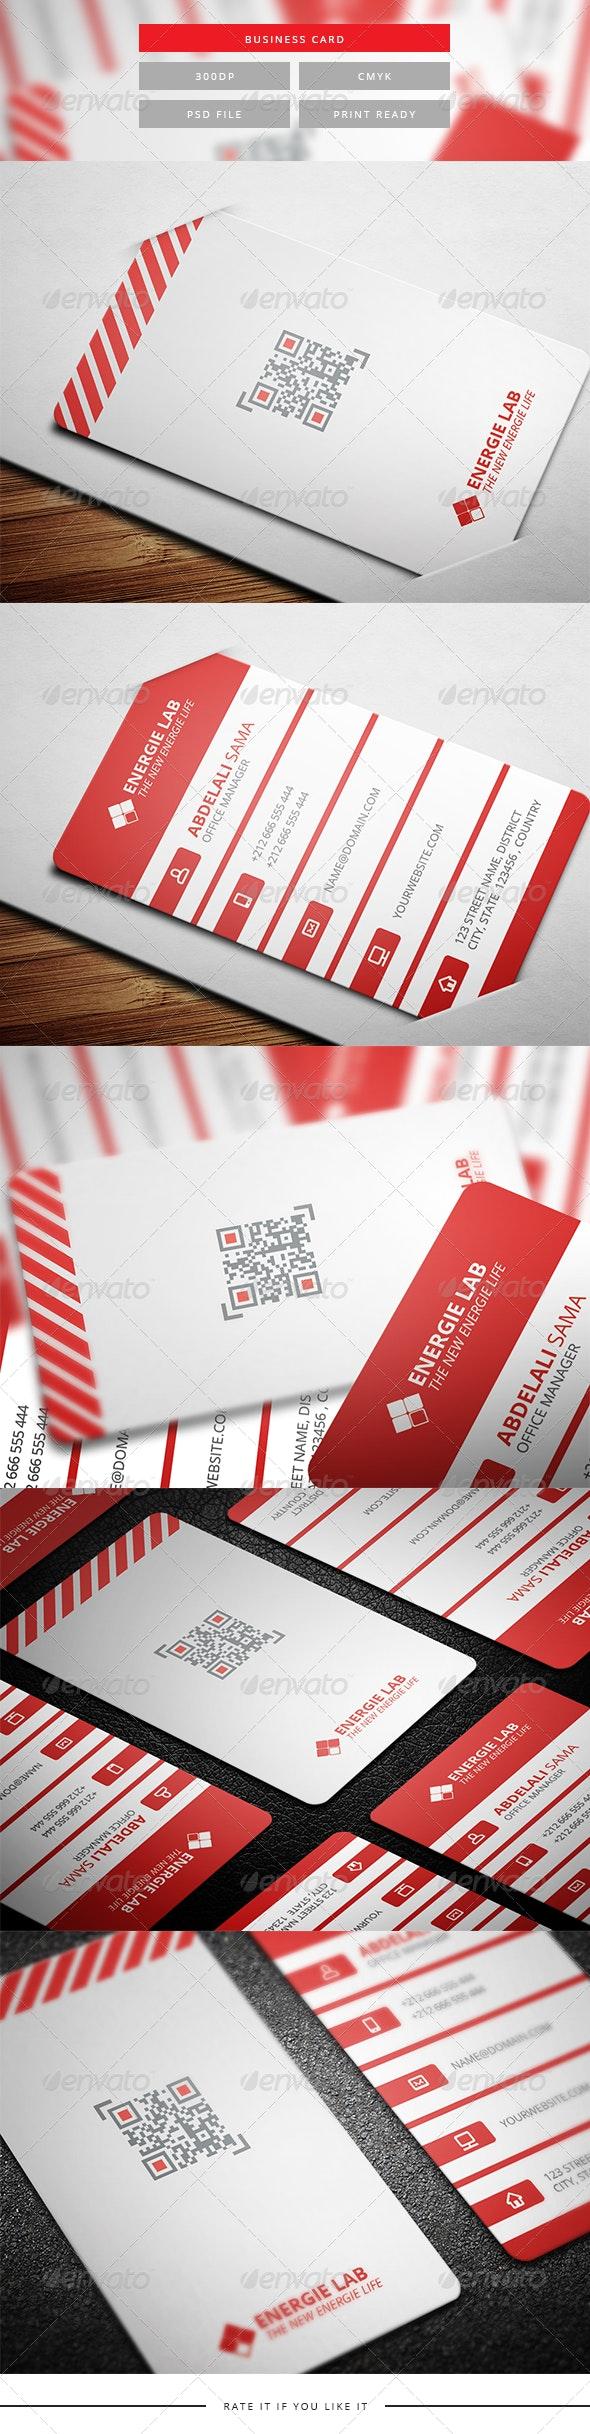 Corporate Business Card 6 - Corporate Business Cards